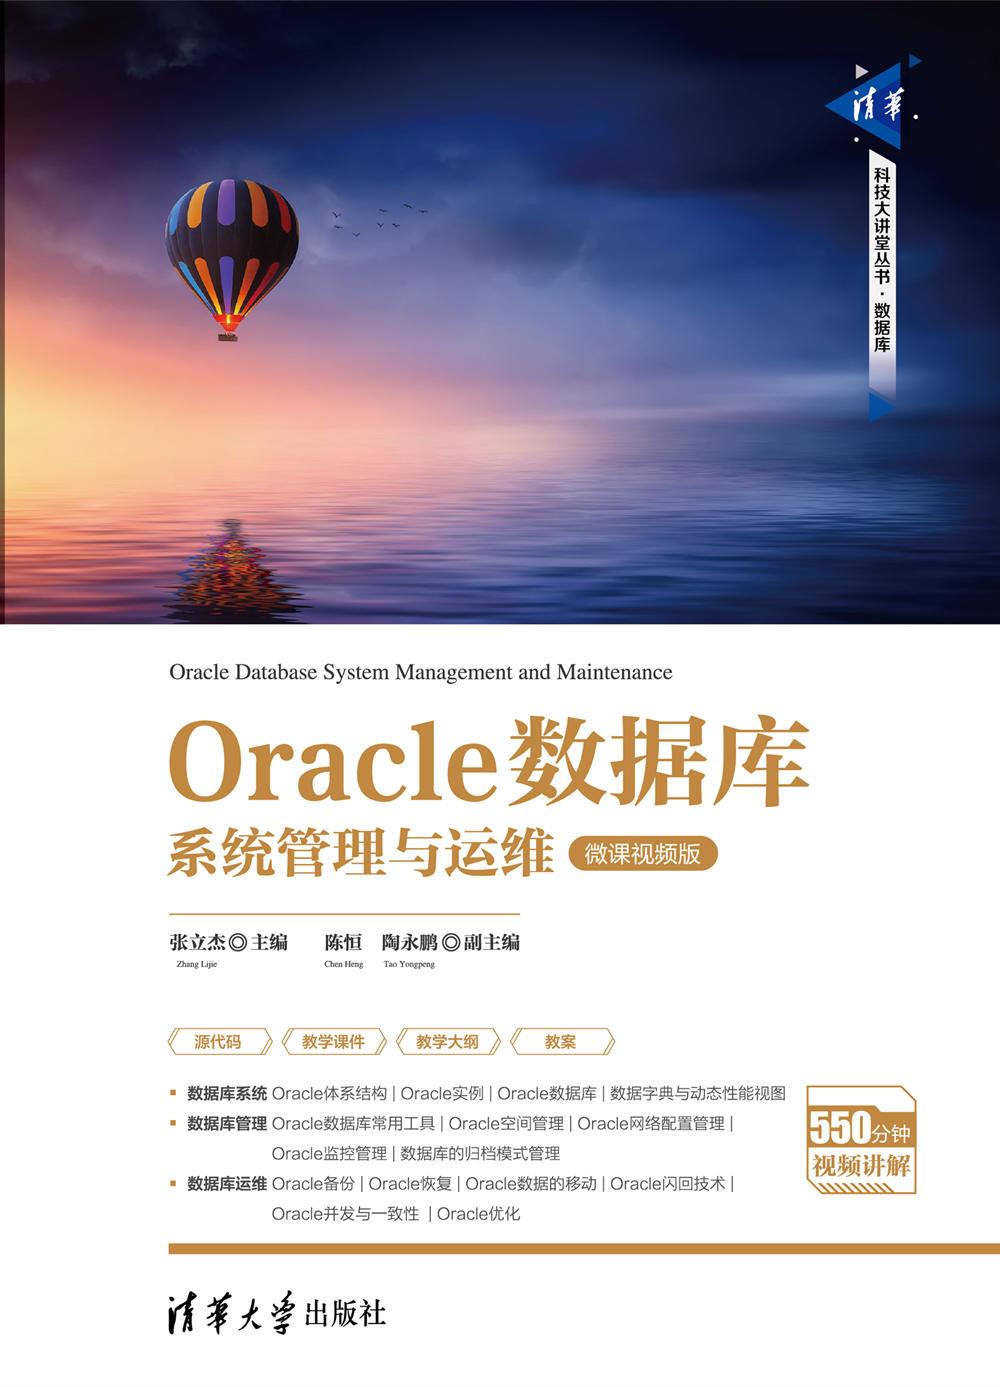 Oracle數據庫系統管理與運維-微課視頻版-preview-1